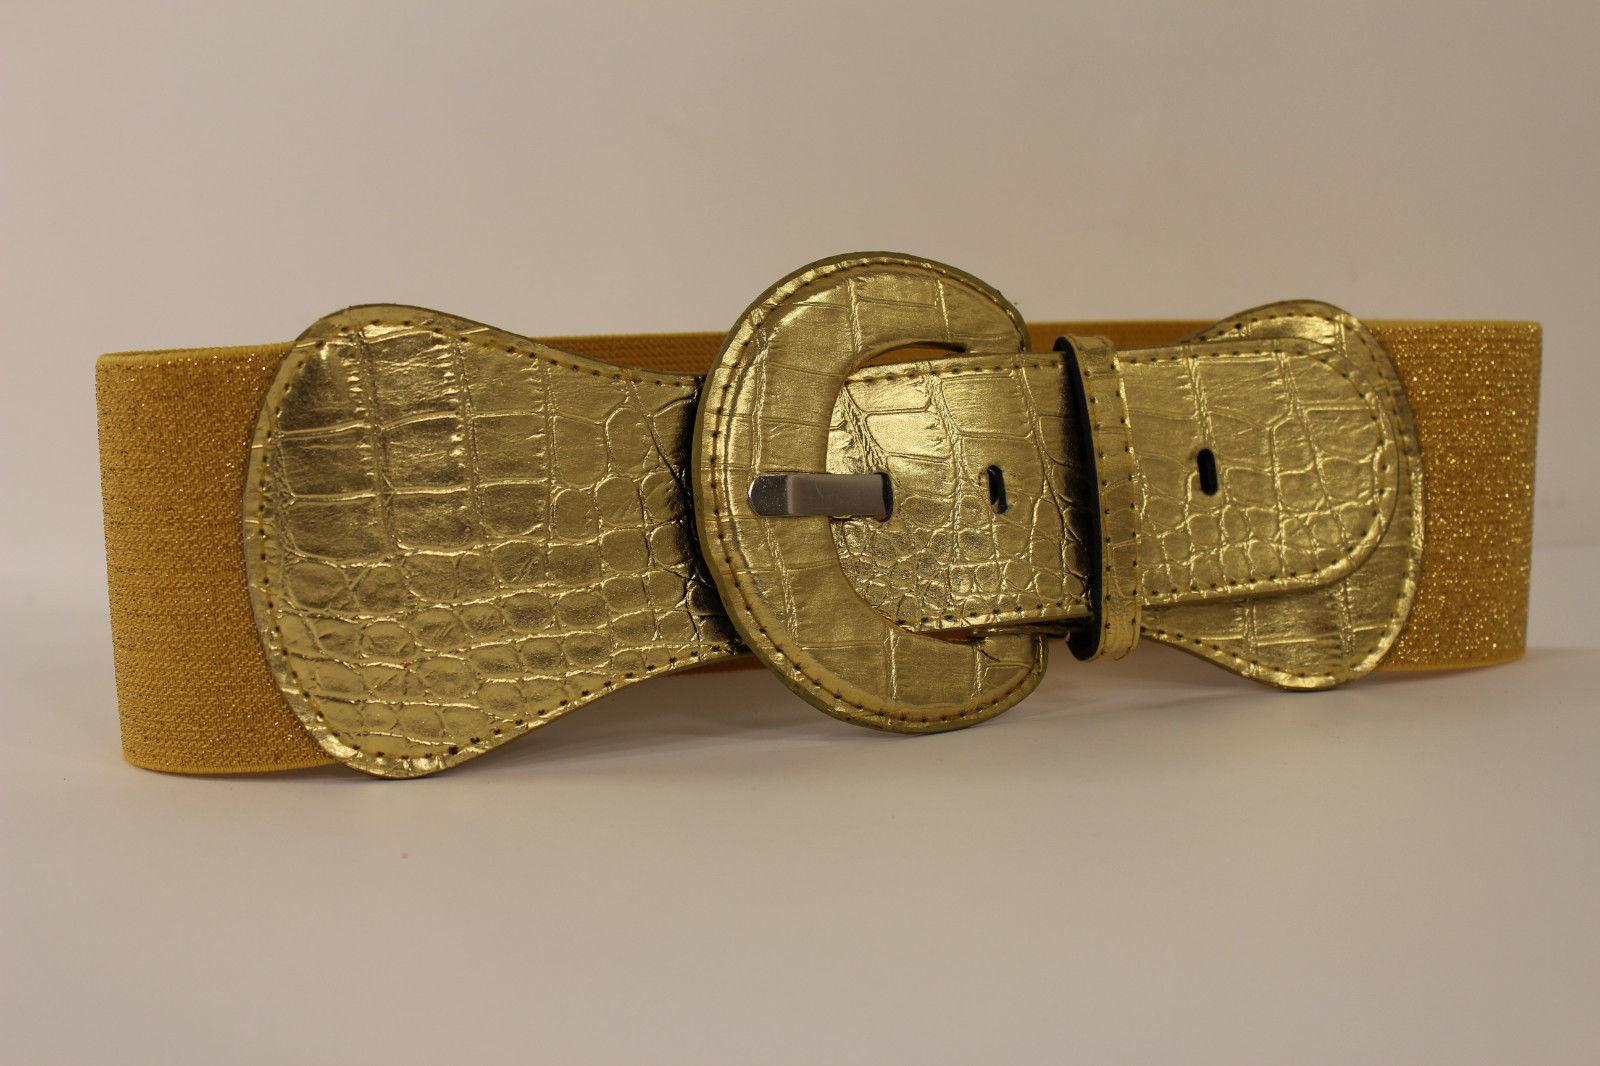 New Women Fashion Belt Metallic Gold Elastic Band Hip / High Waist Stretch Wide